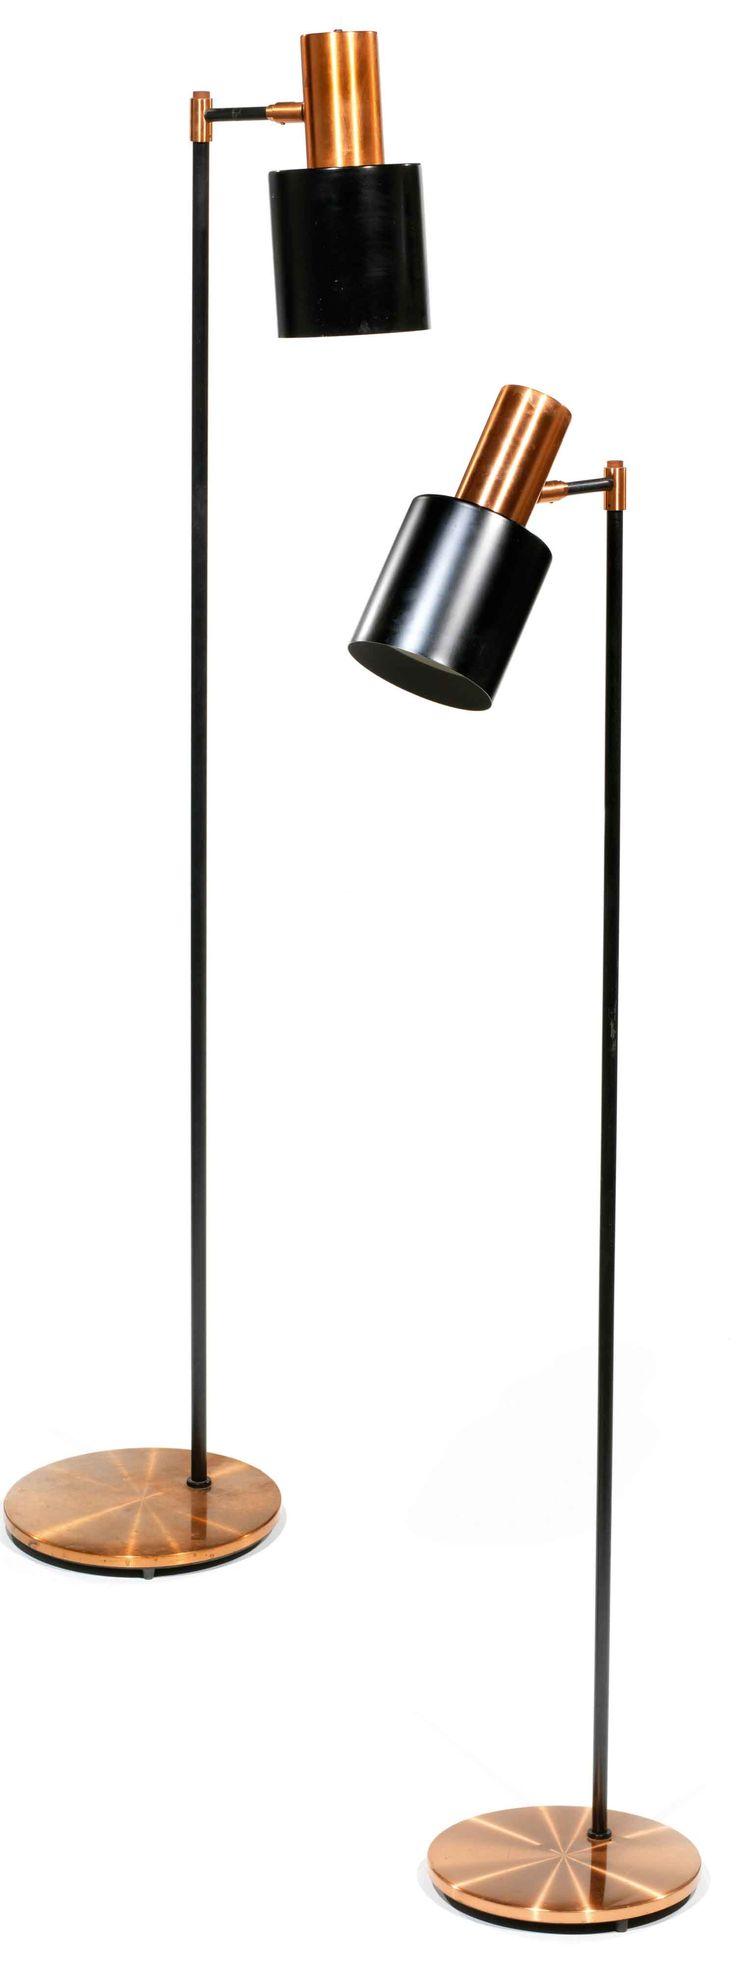 Jo Hammerborg; Copper and Enameled Metal Floor Lamps, c1960.